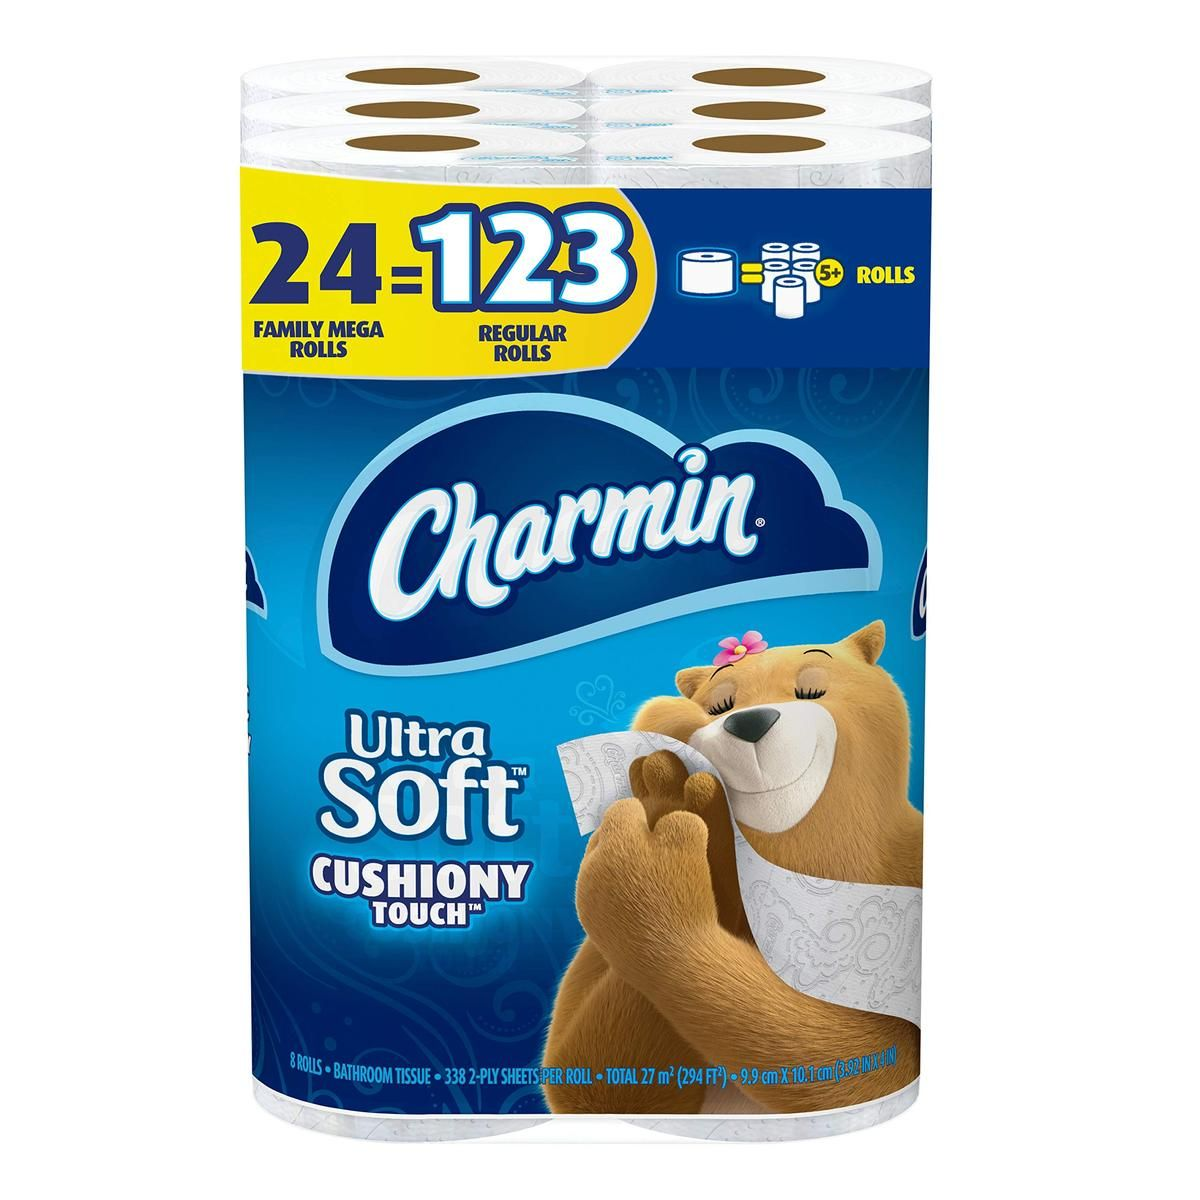 Charmin Ultra Soft Cushiony Touch Toilet Paper 24 Family Mega Rolls 123 Regular Rolls In 2020 Charmin Bath Tissue Room Deodorizer